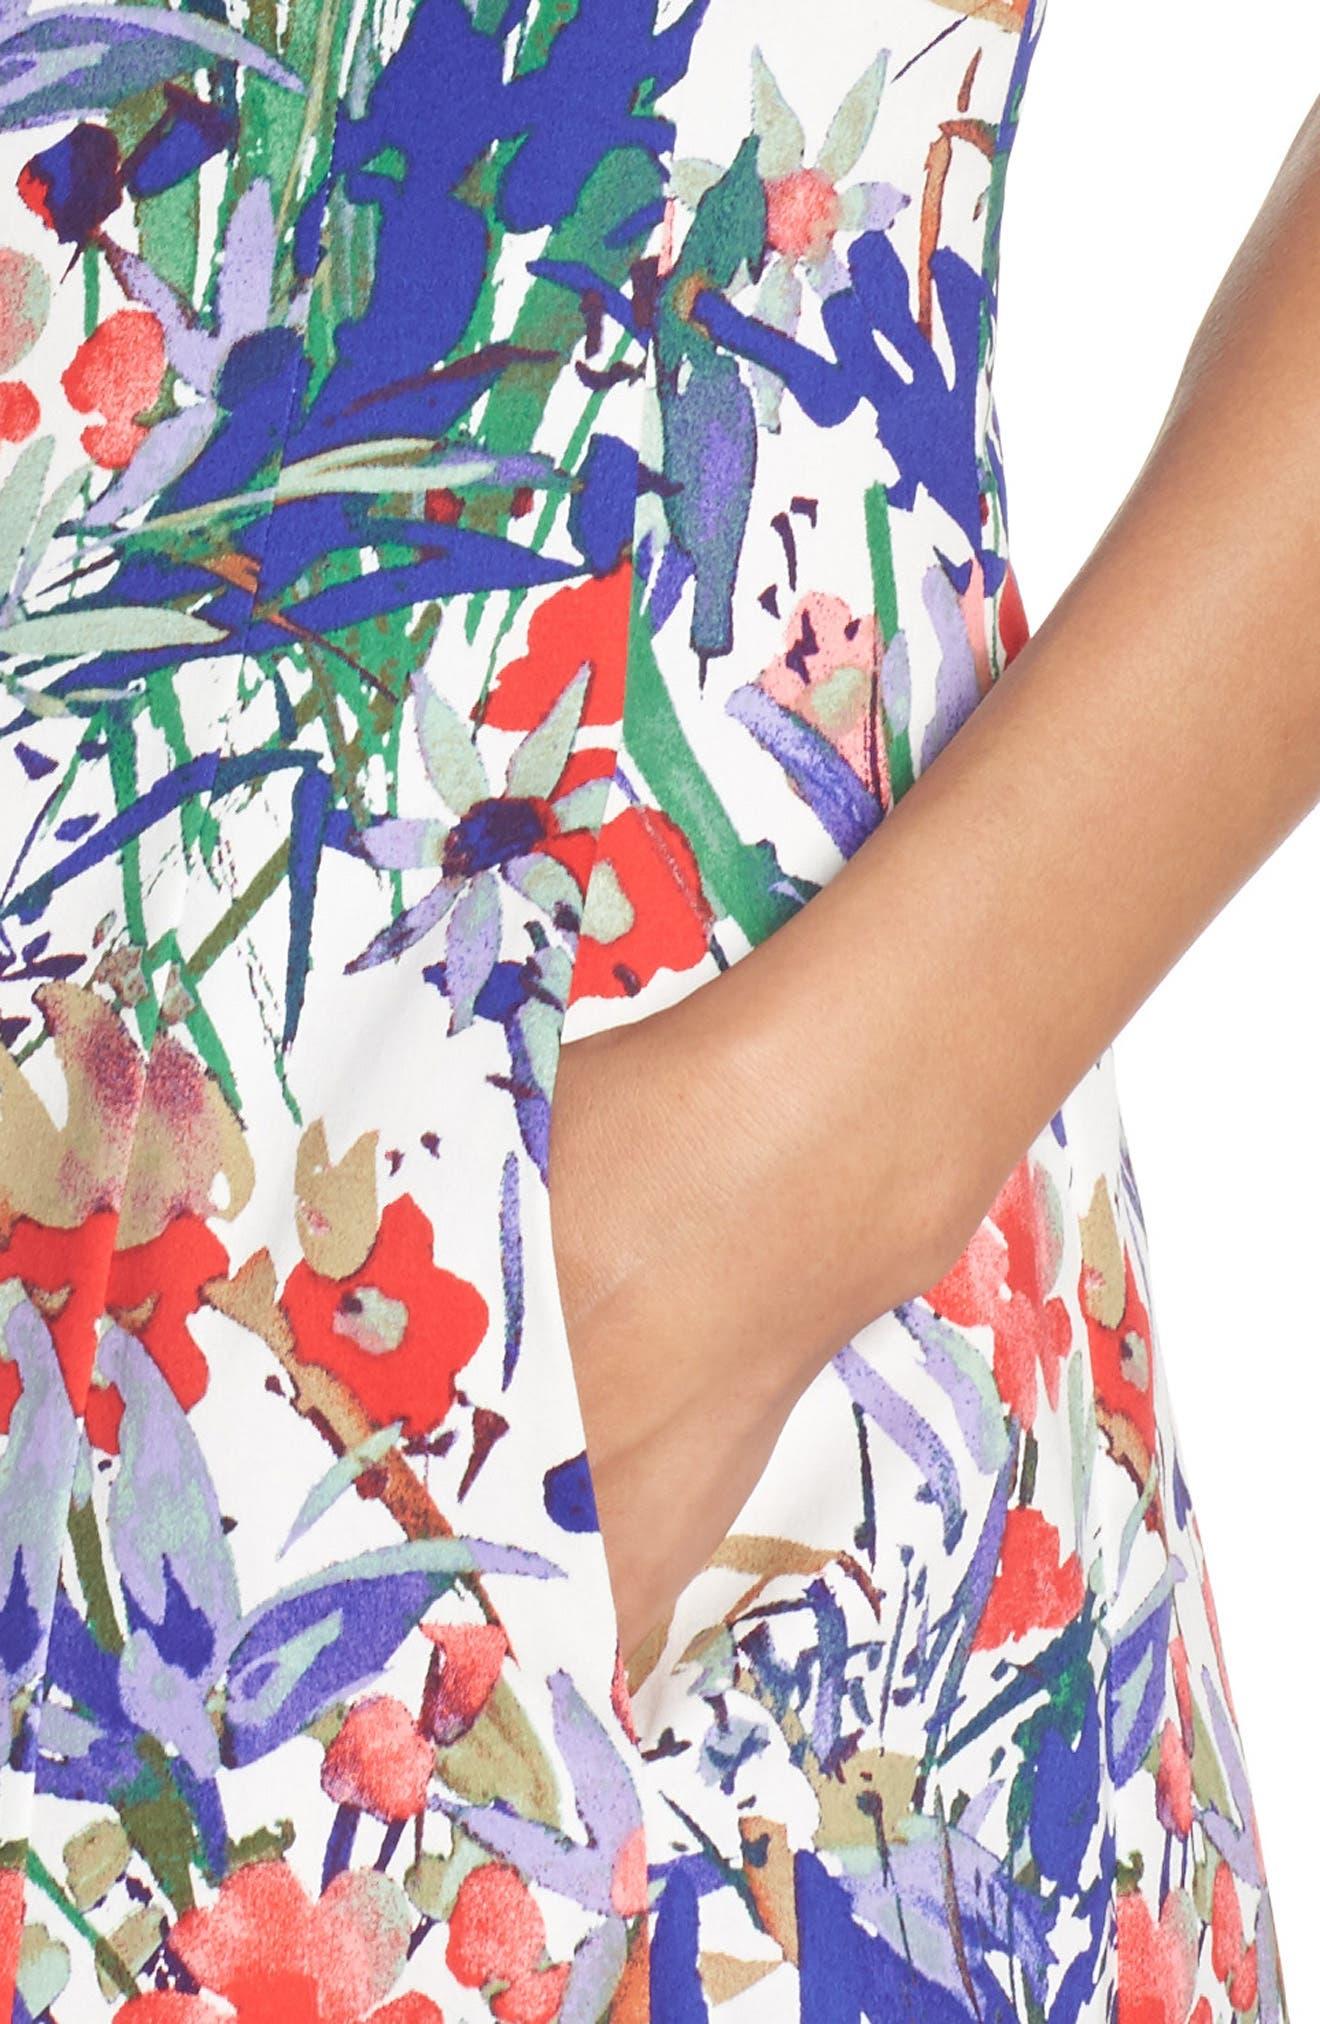 Cottage Garden Fit & Flare Dress,                             Alternate thumbnail 4, color,                             Soft White/ Coral/ Purple